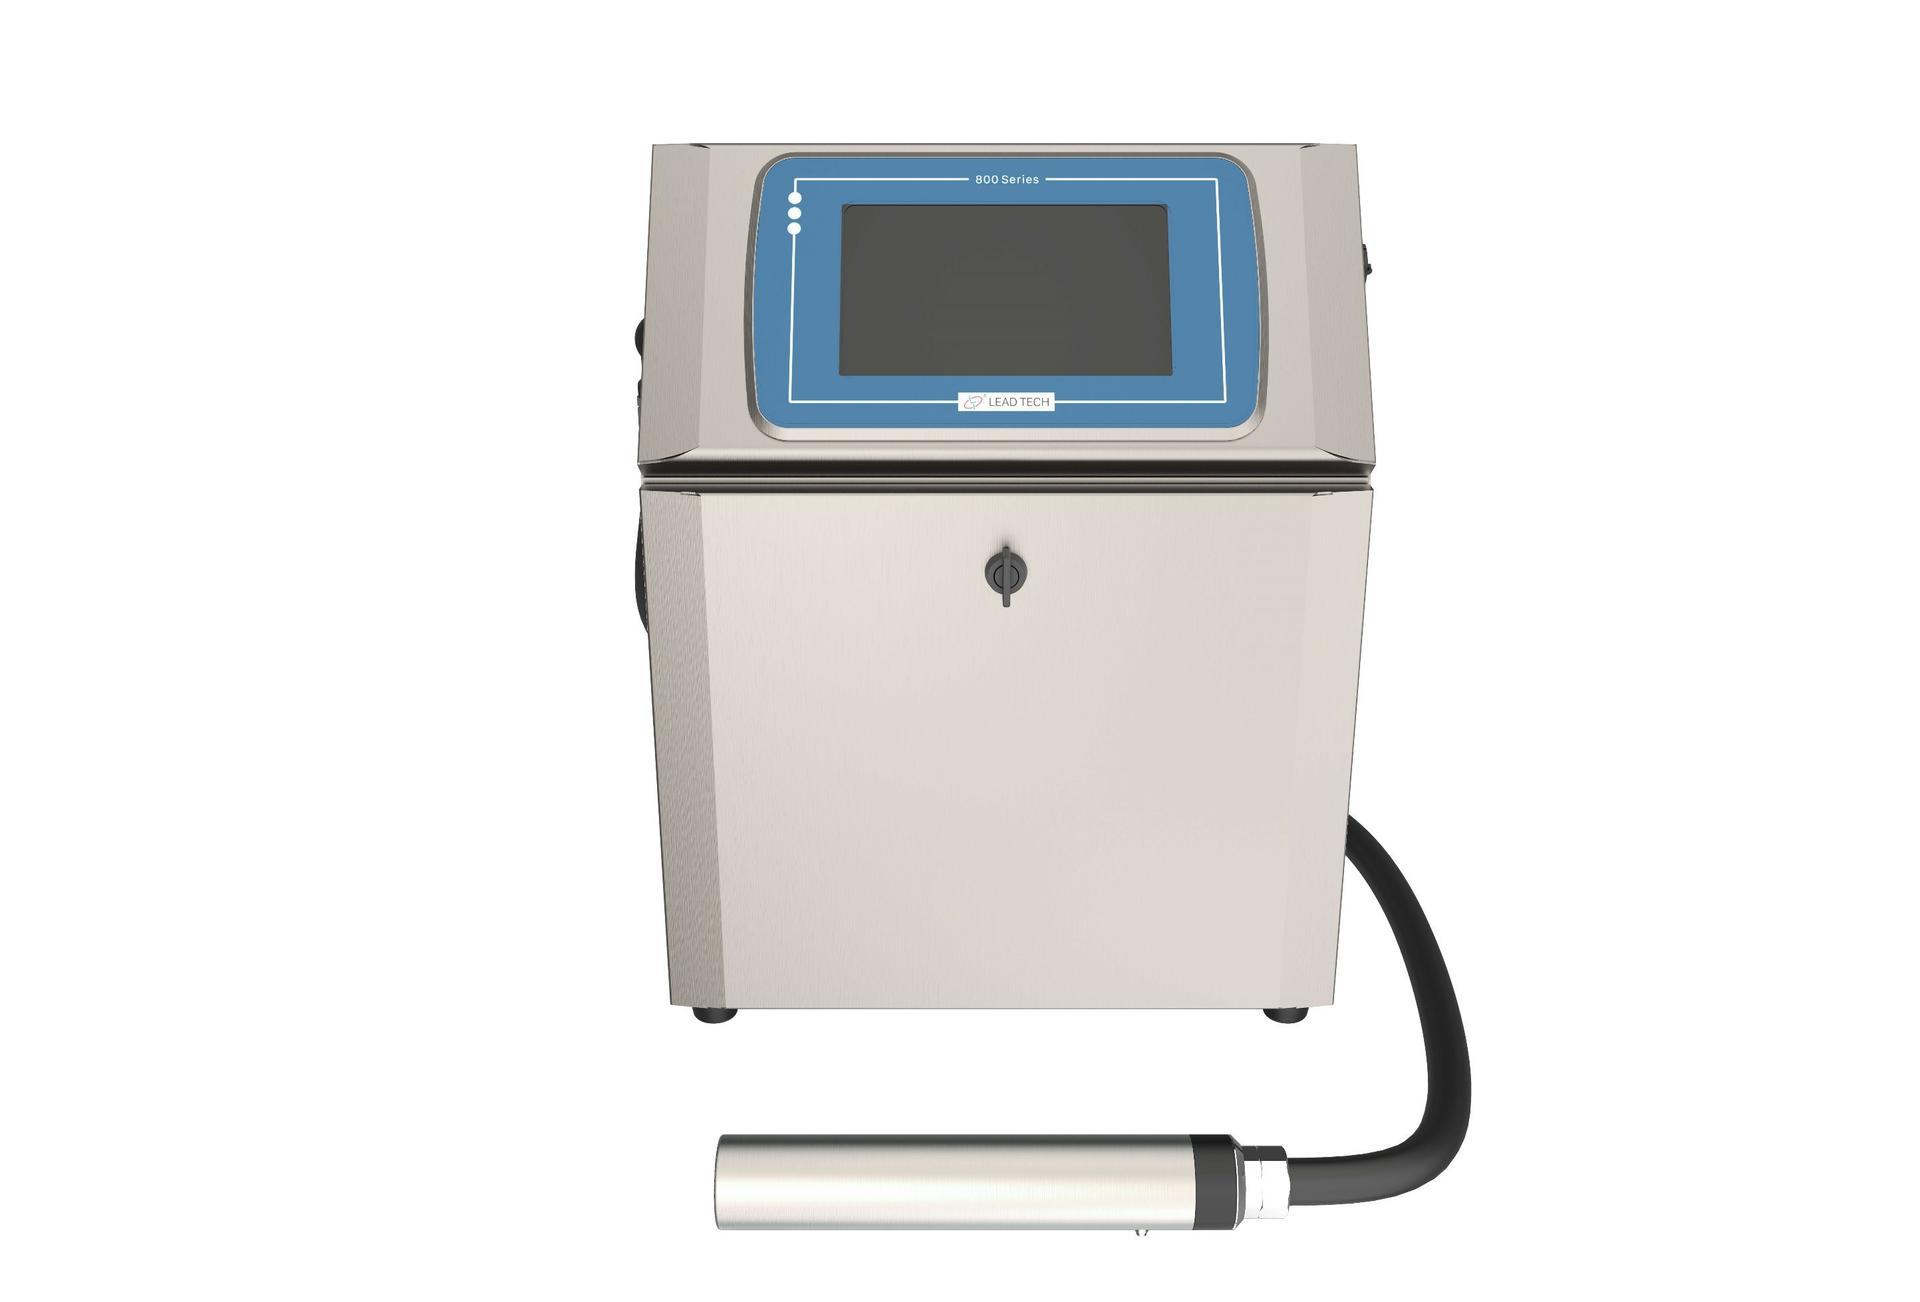 Lead Tech Lt800 Reverse Printing Cij Inkjet Printer